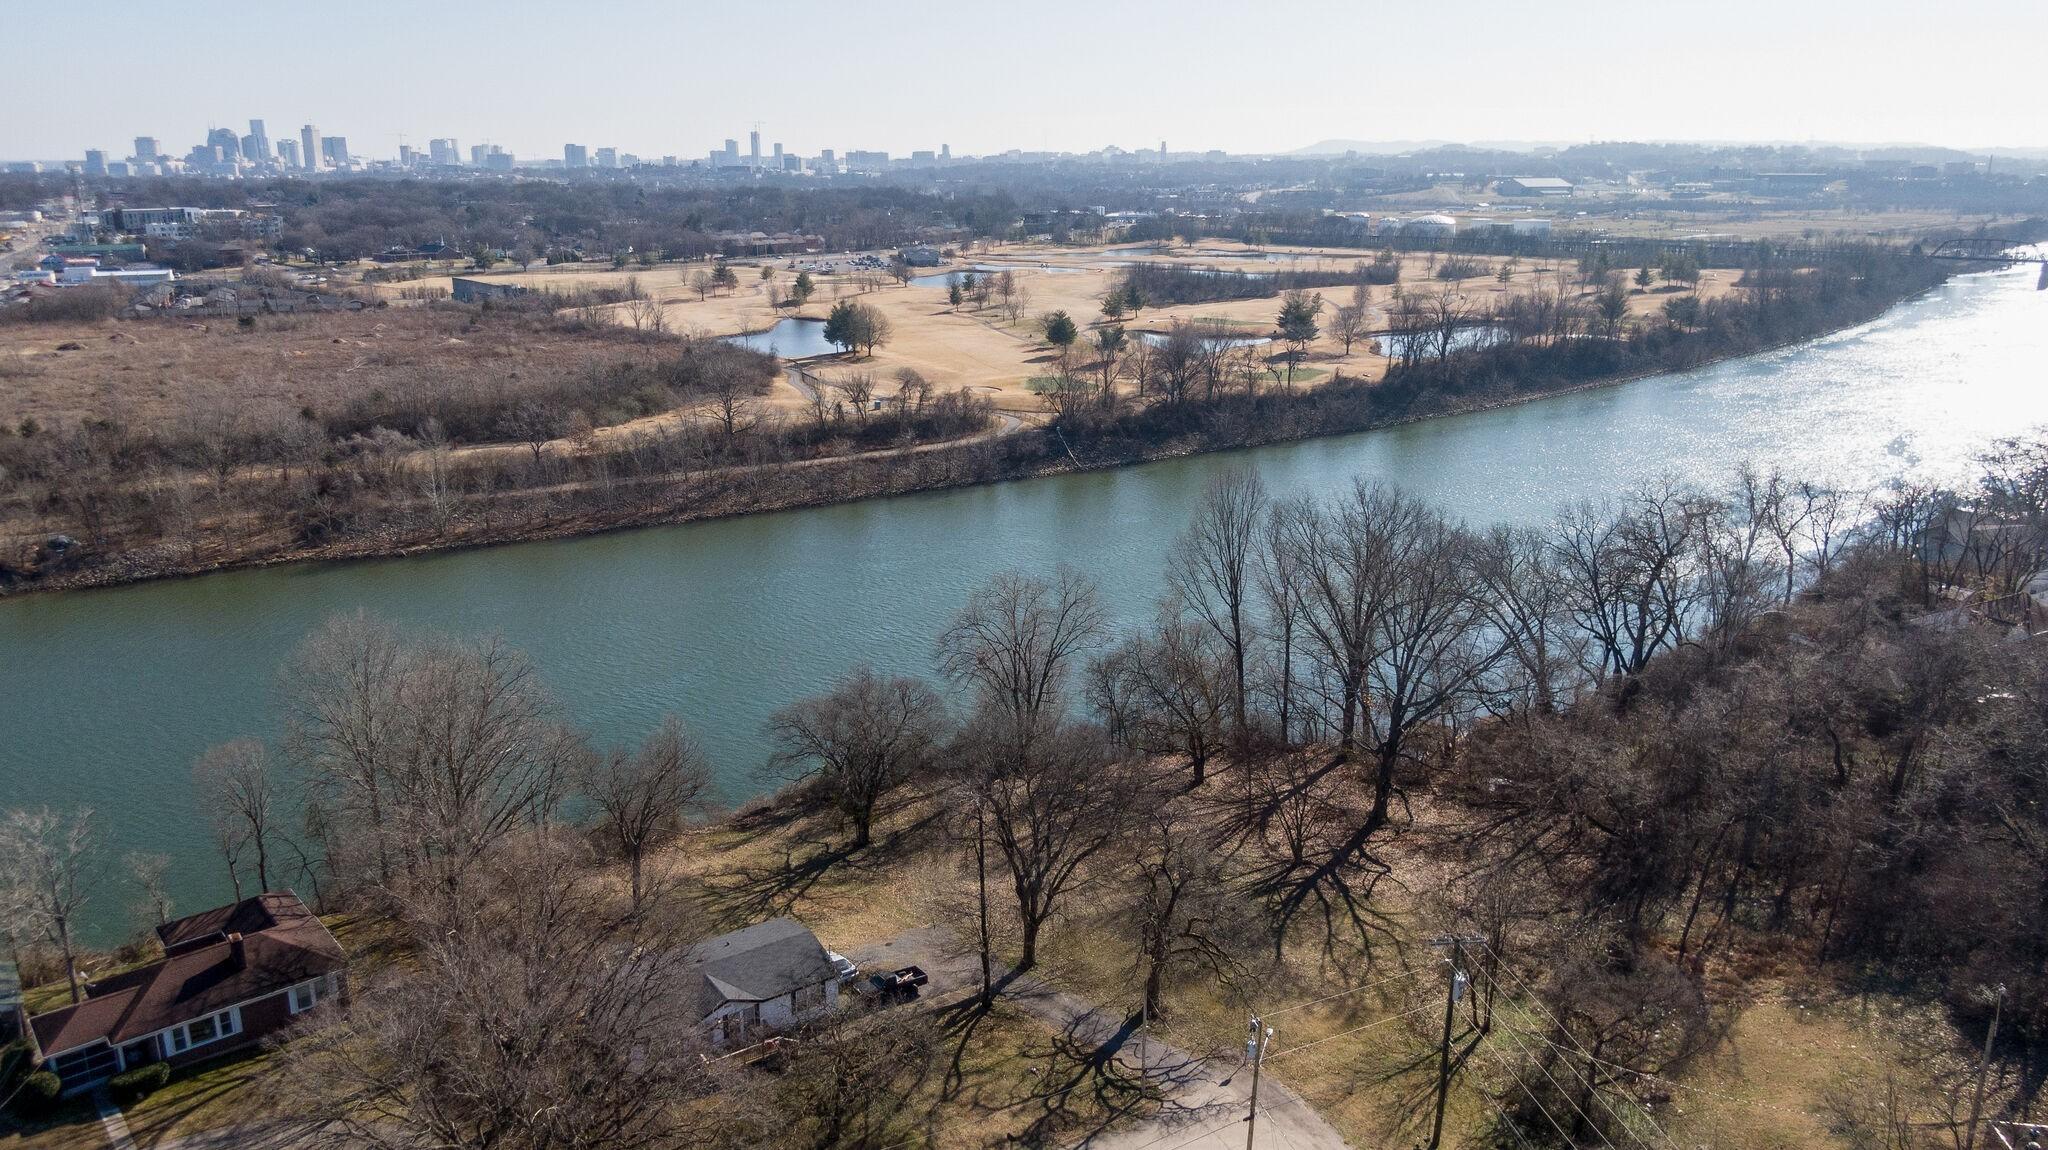 2000 Rivercliff Dr-Lot 19,20,21 Property Photo - Nashville, TN real estate listing